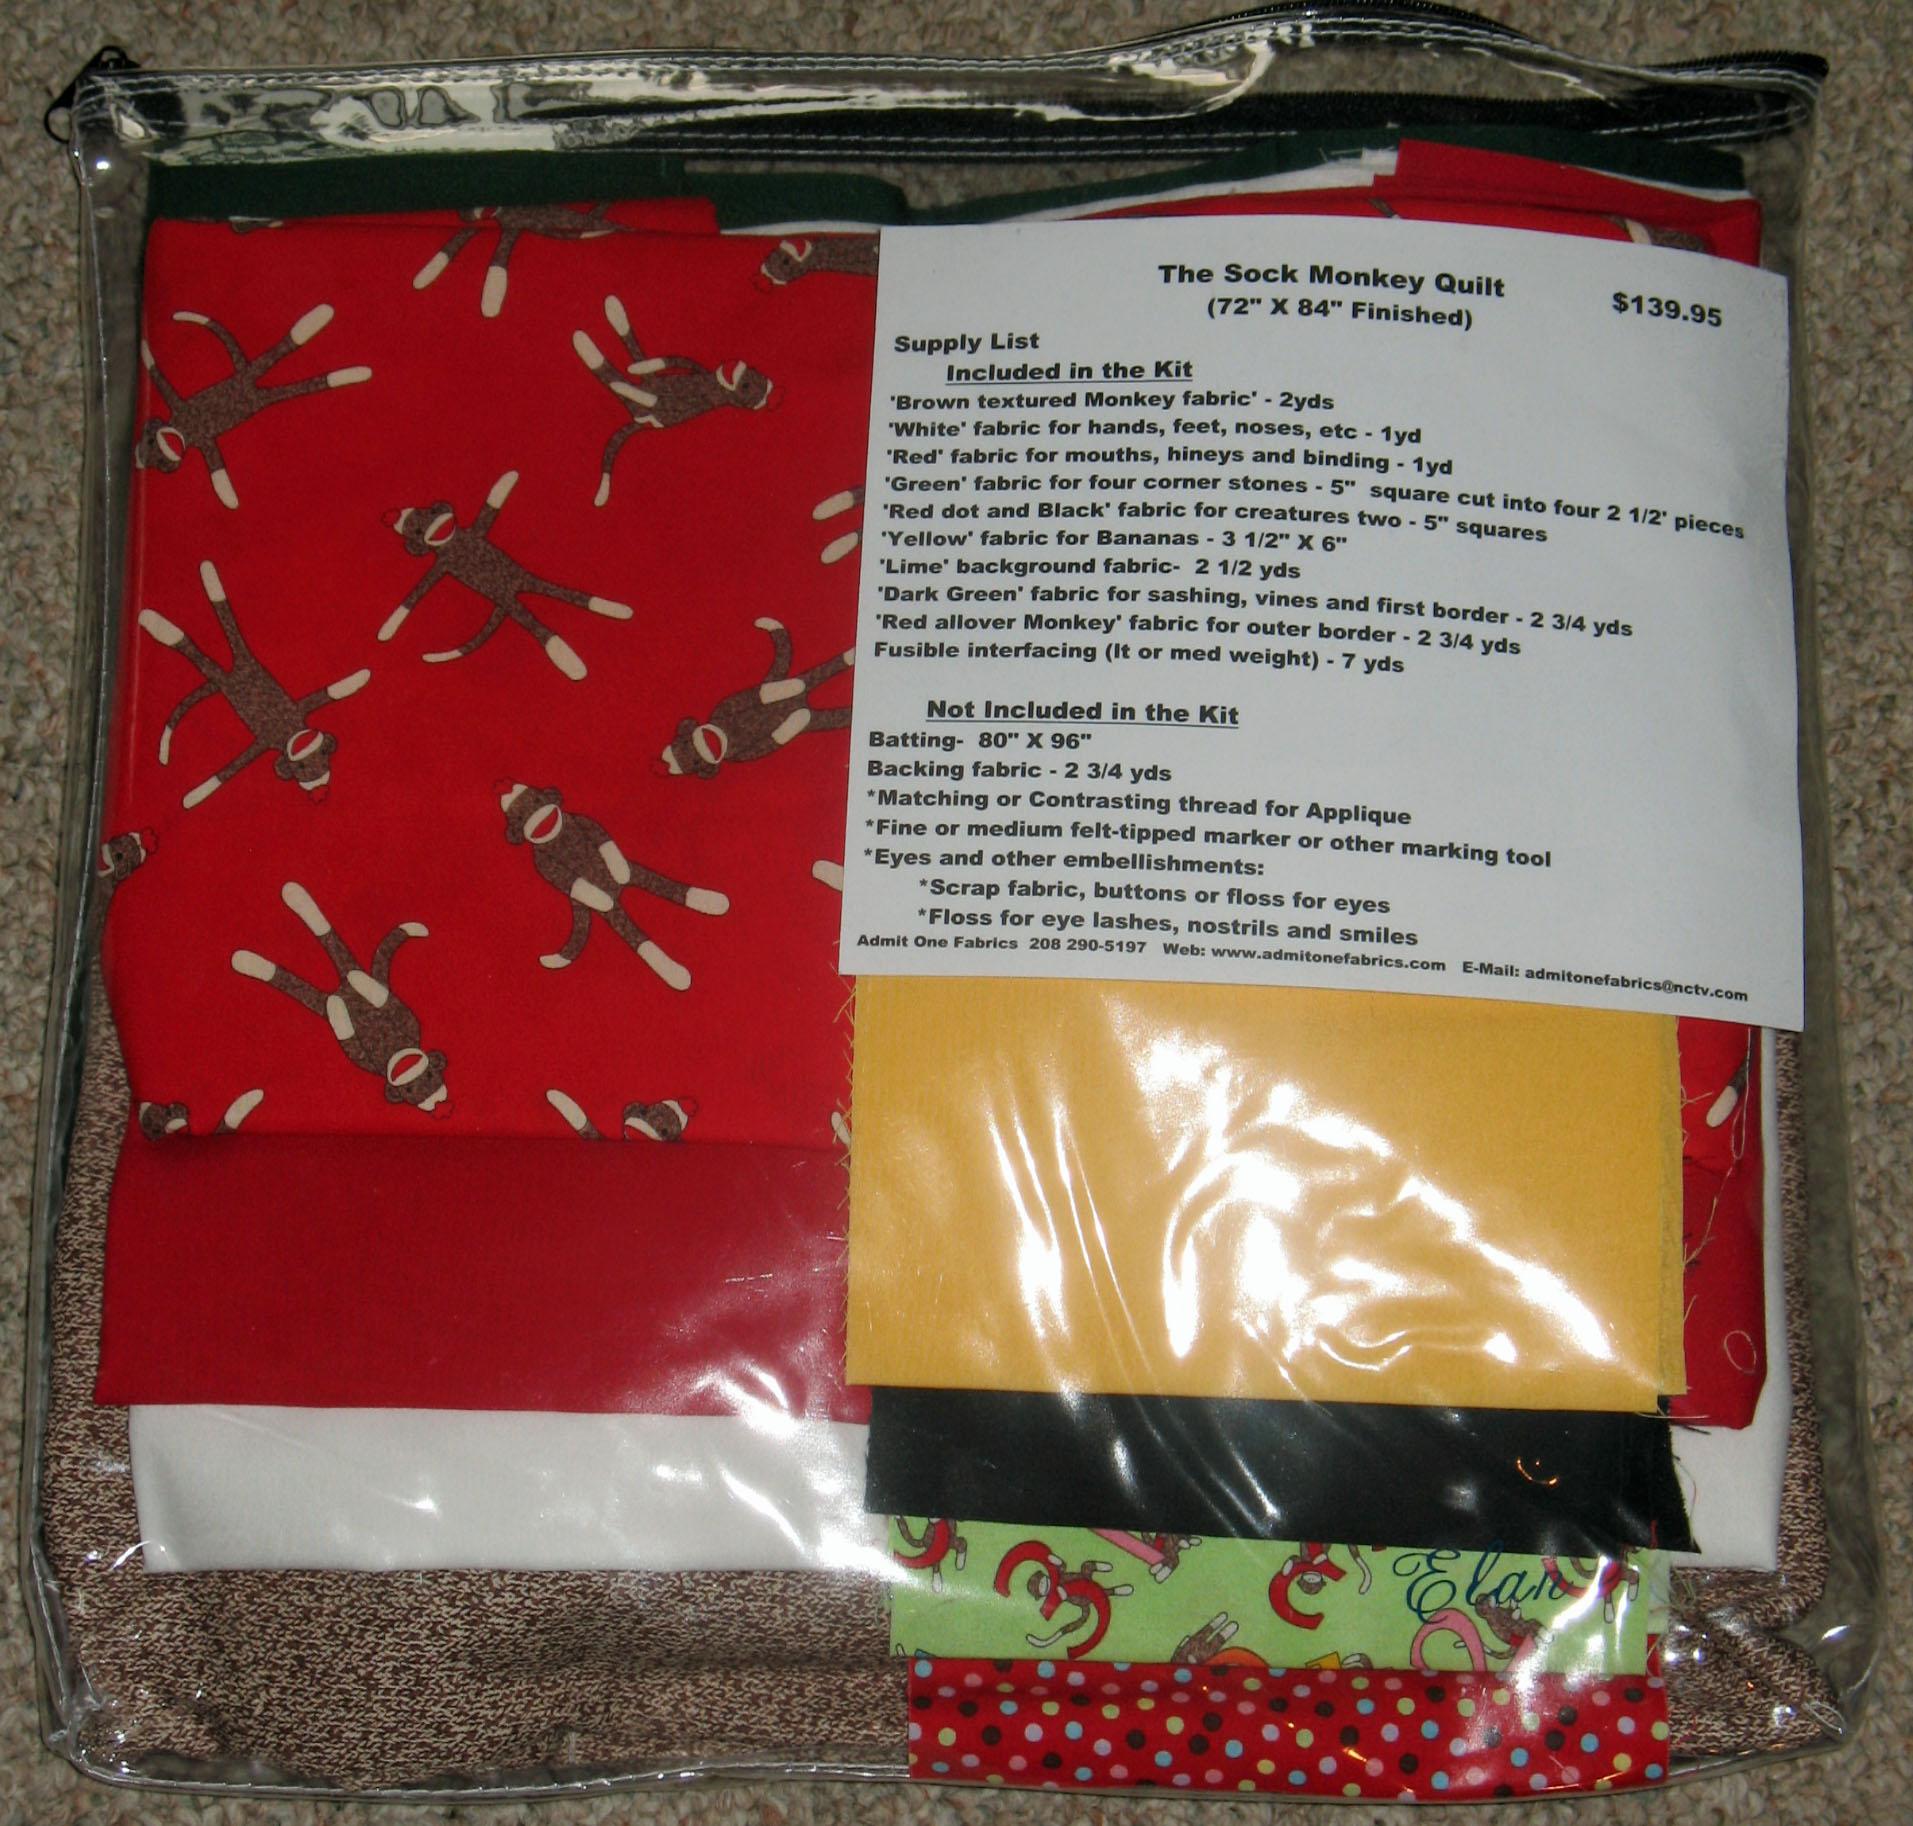 Funky Monkey Fabric and Kits - Admit One Fabrics